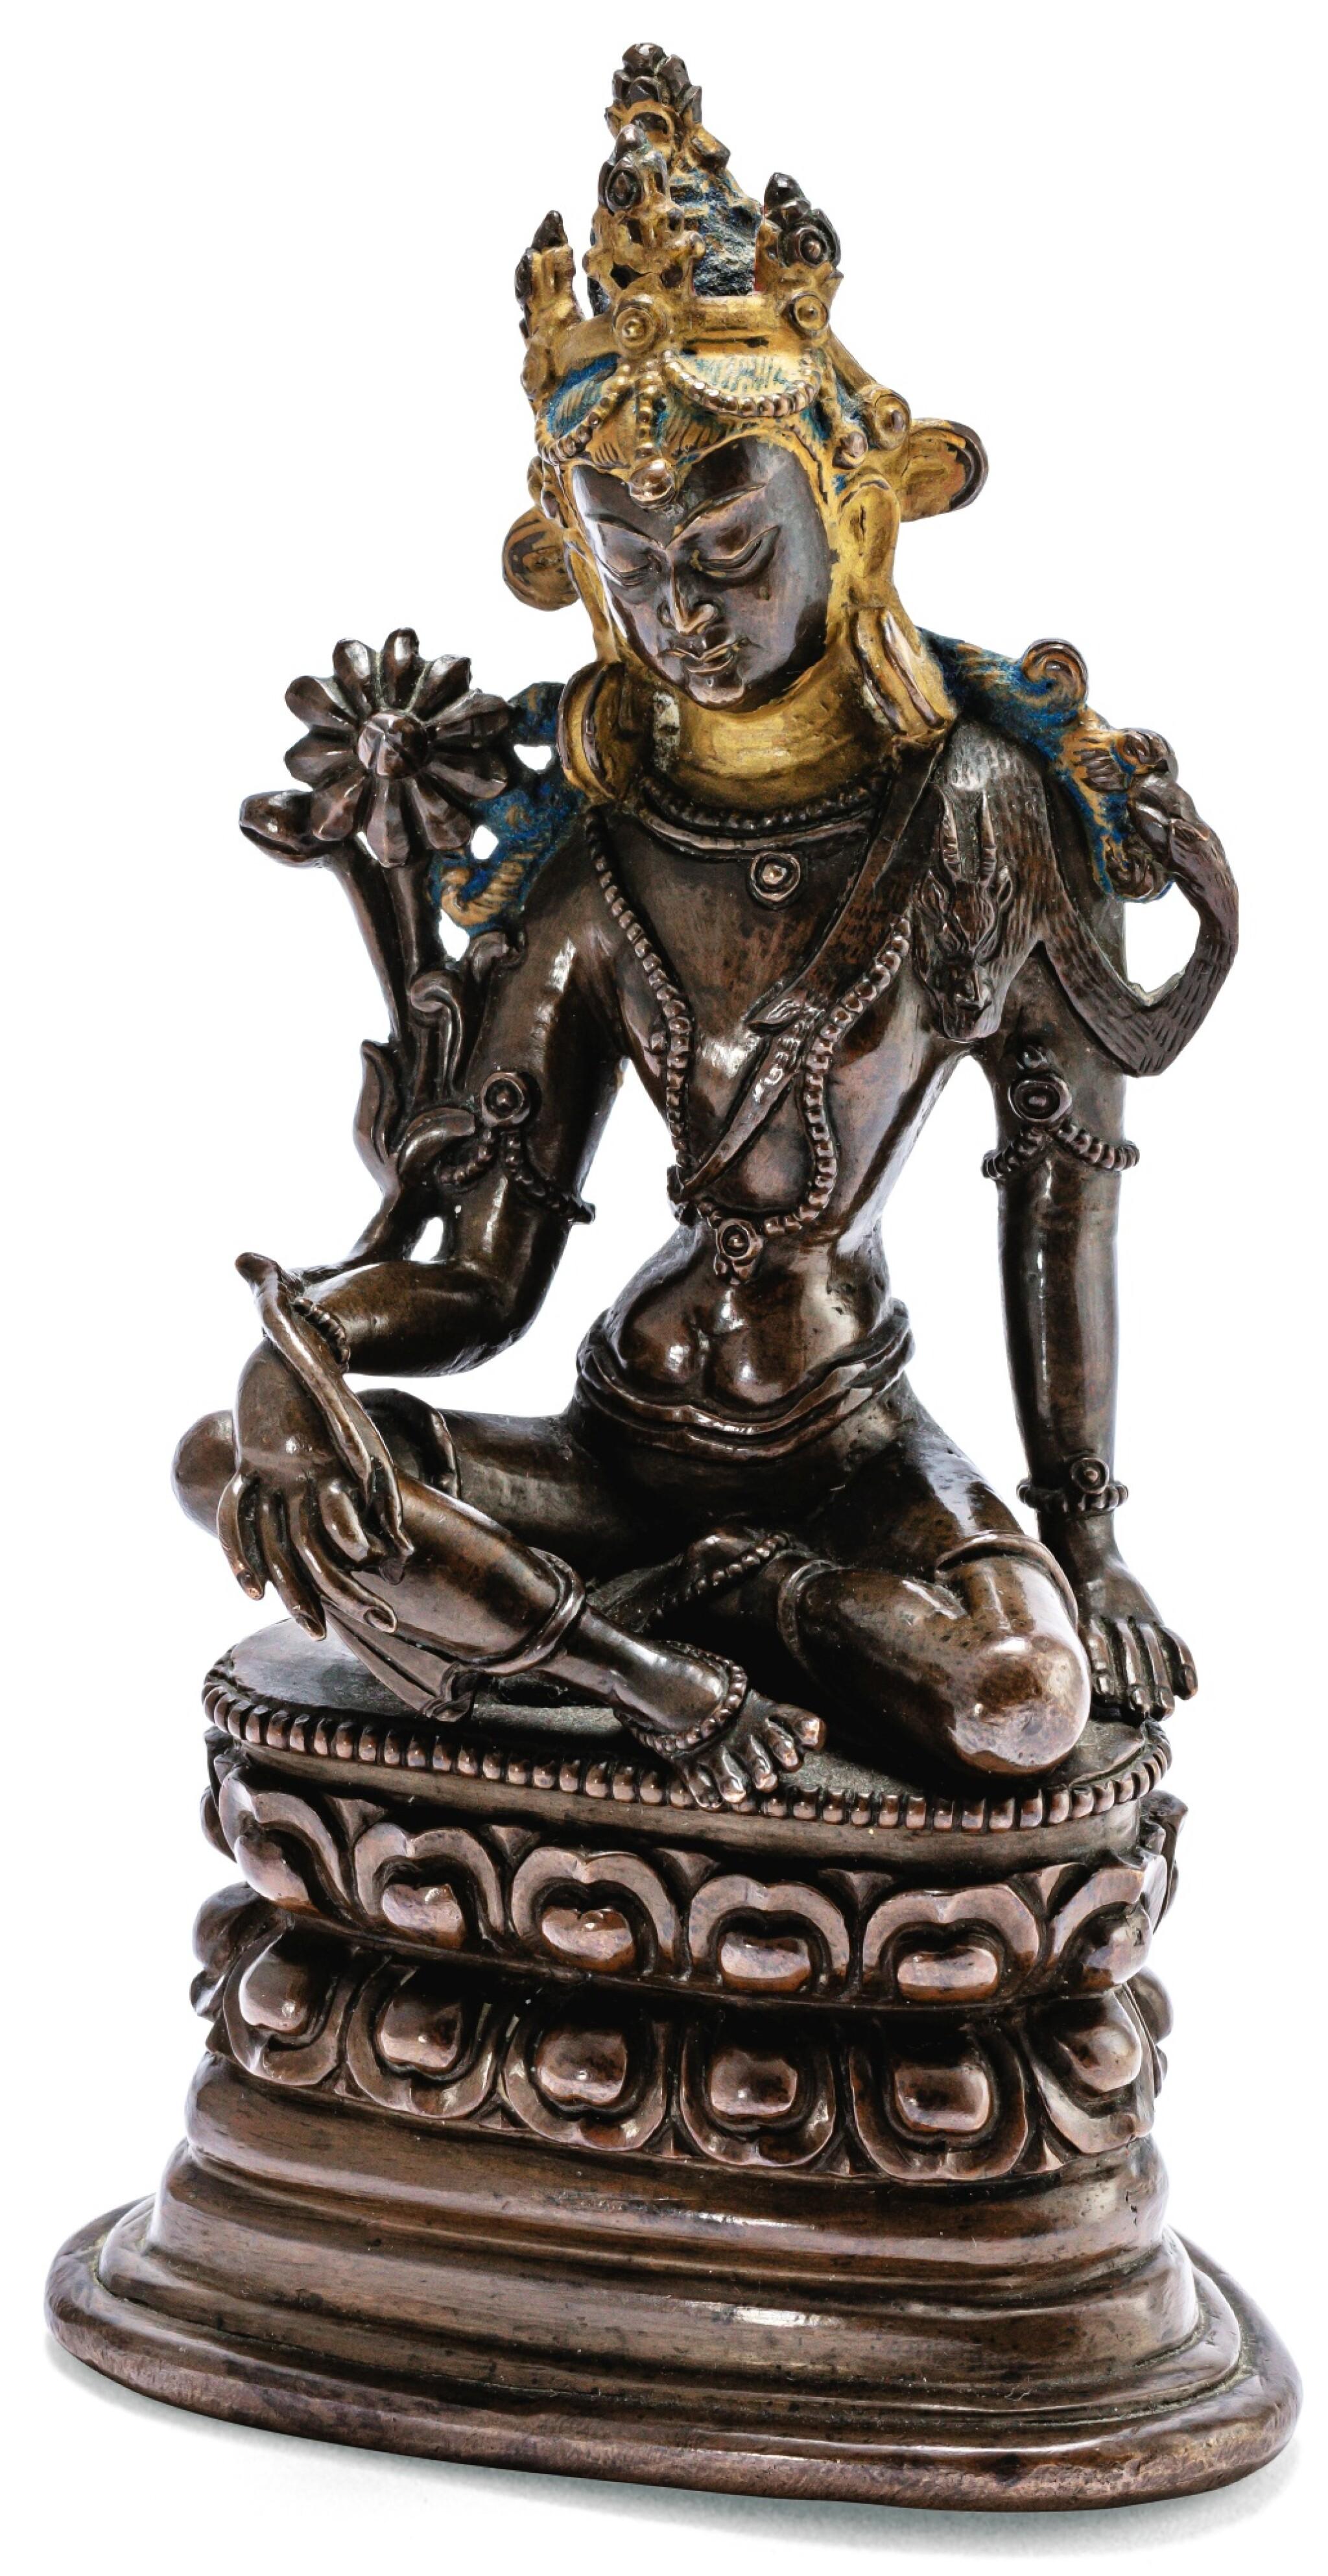 STATUETTE DE BODHISATTVA EN ALLIAGE DE CUIVRE TIBET, STYLE PALA, CA. XVIIIE SIÈCLE   西藏 約十八世紀 銅合金帕拉式菩薩坐像   A copper-alloy Pala style figure of Bodhisattva, Tibet, ca. 18th century